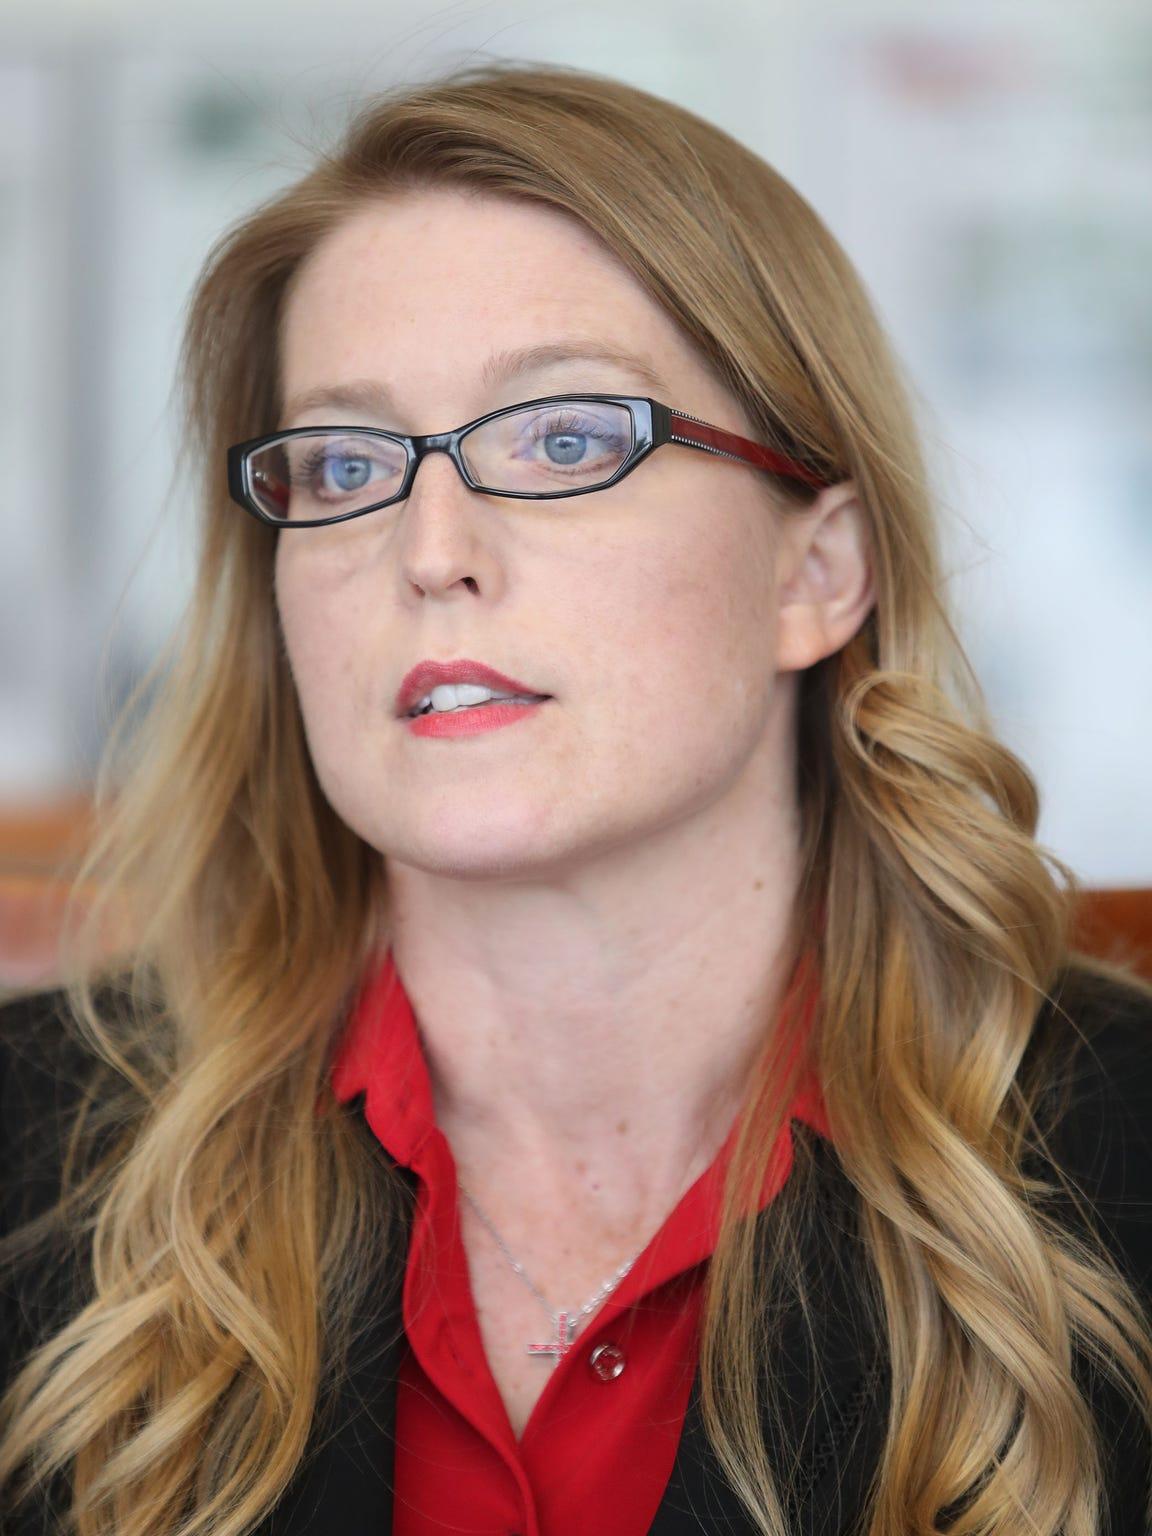 Riverside County District Attorney candidate Lara Gressley